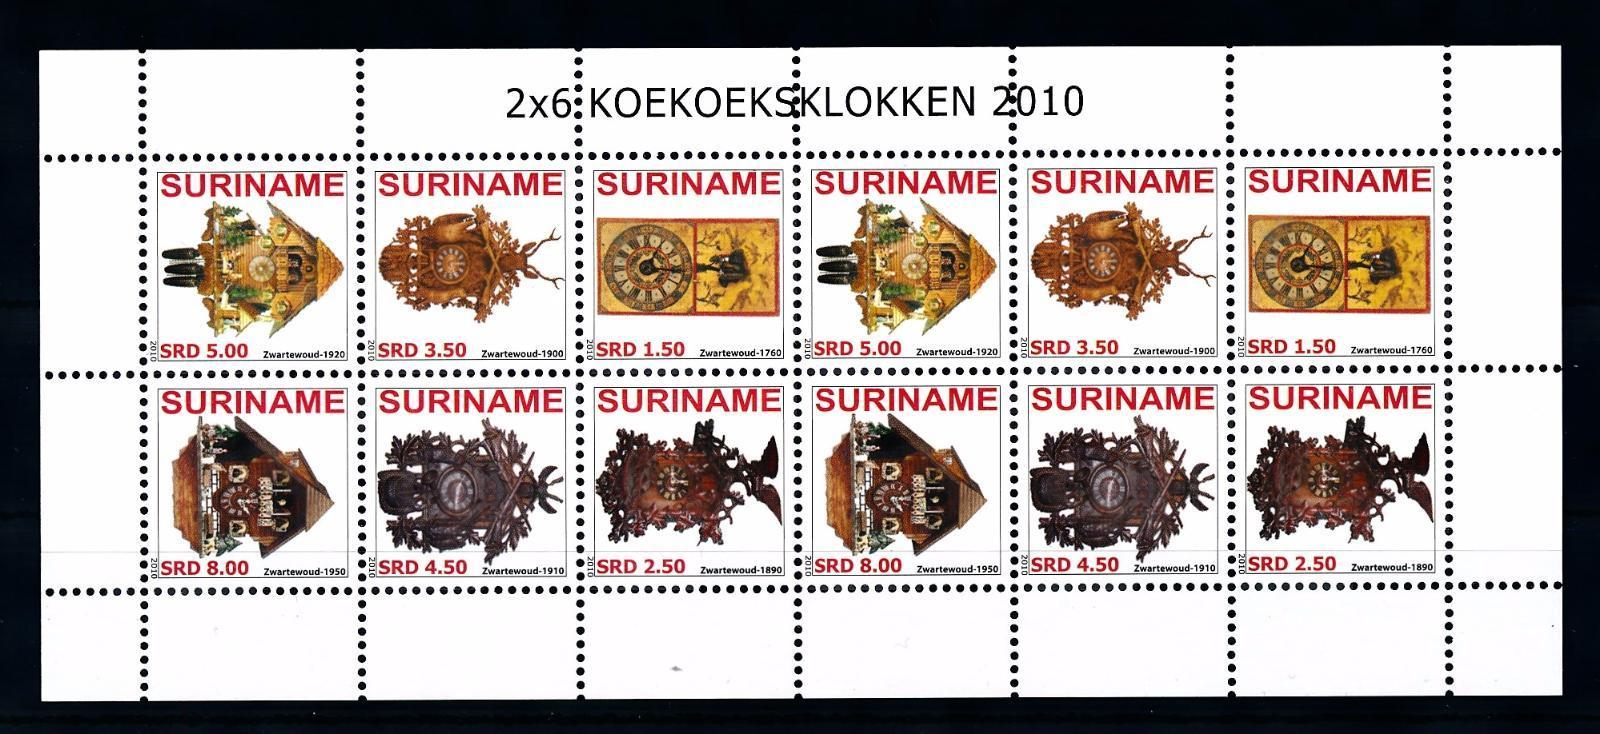 SUV1698] Surinam 2010 Cuckoo Clocks Miniature sheet MNH